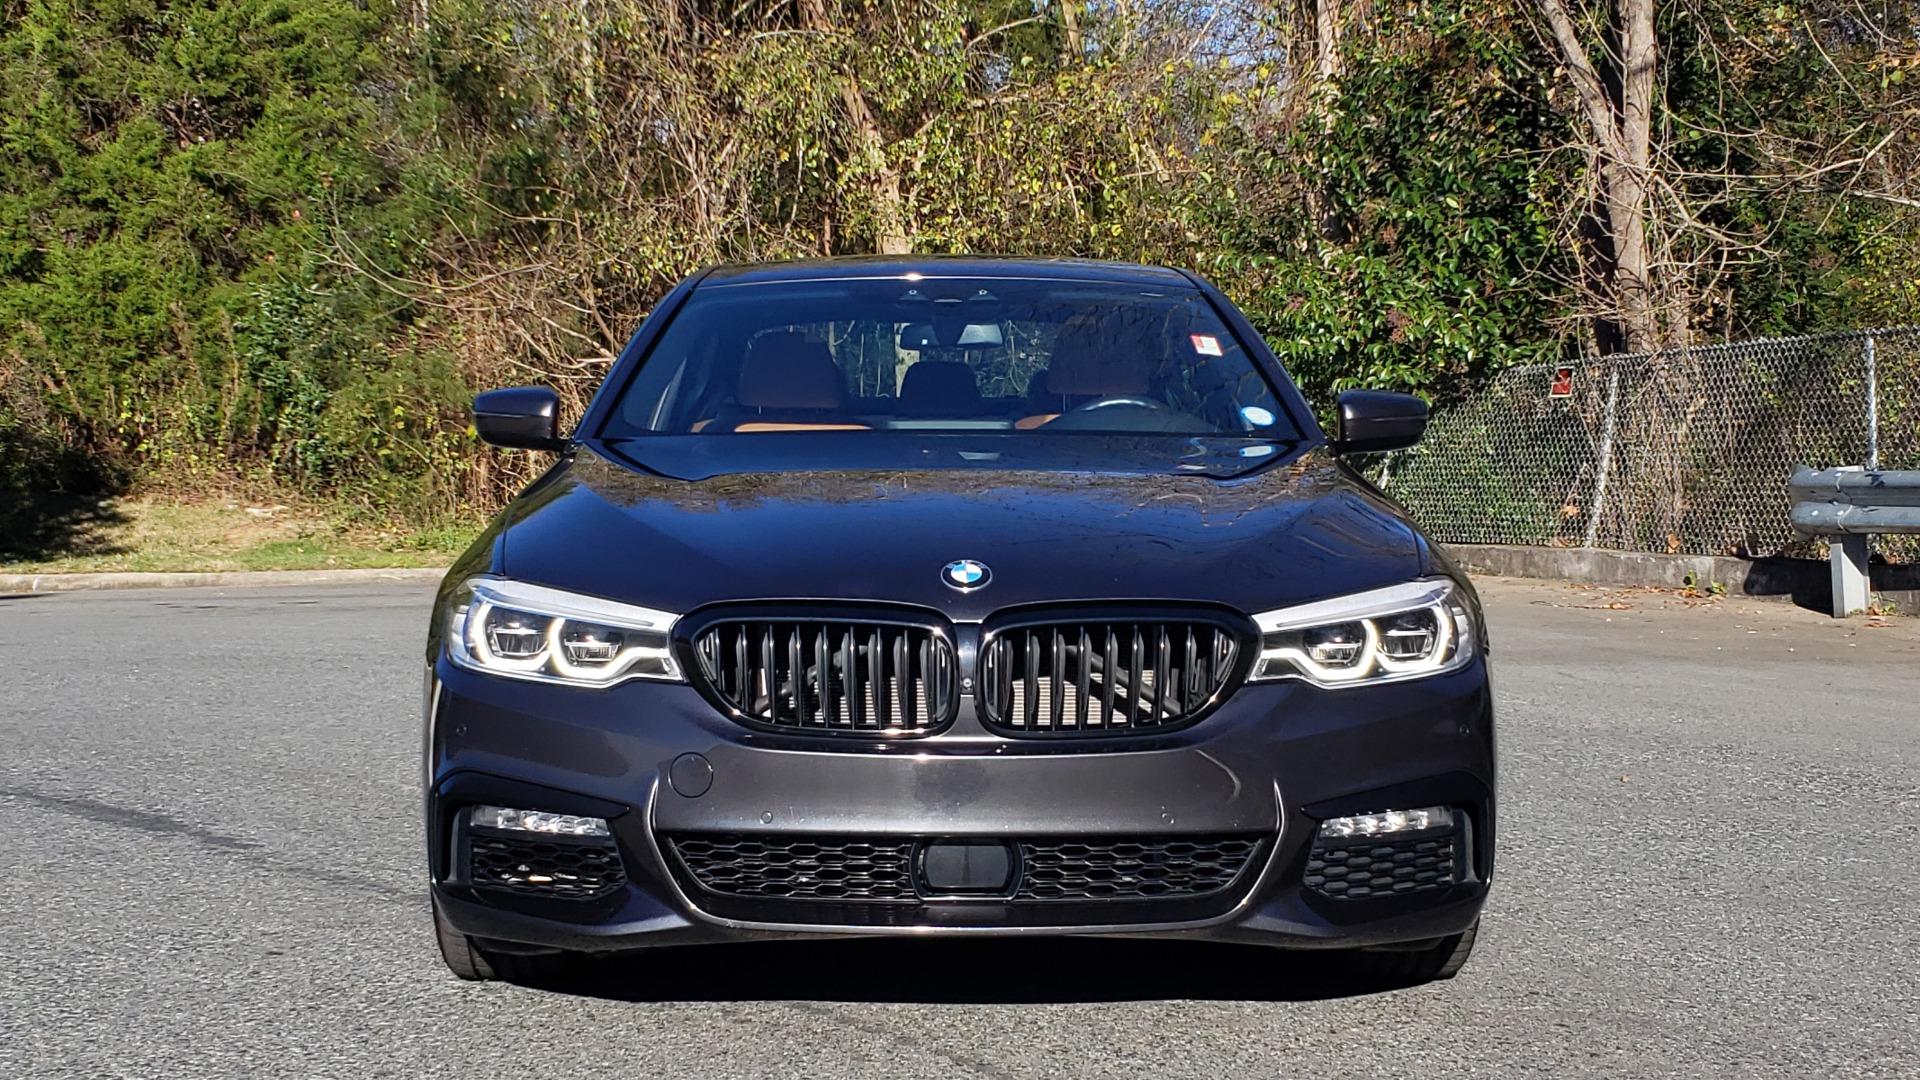 Used 2018 BMW 5 SERIES 540I M-SPORT / DRVR ASST / EXEC PKG / NAV / SUNROOF / HUD / REARVIEW for sale Sold at Formula Imports in Charlotte NC 28227 18